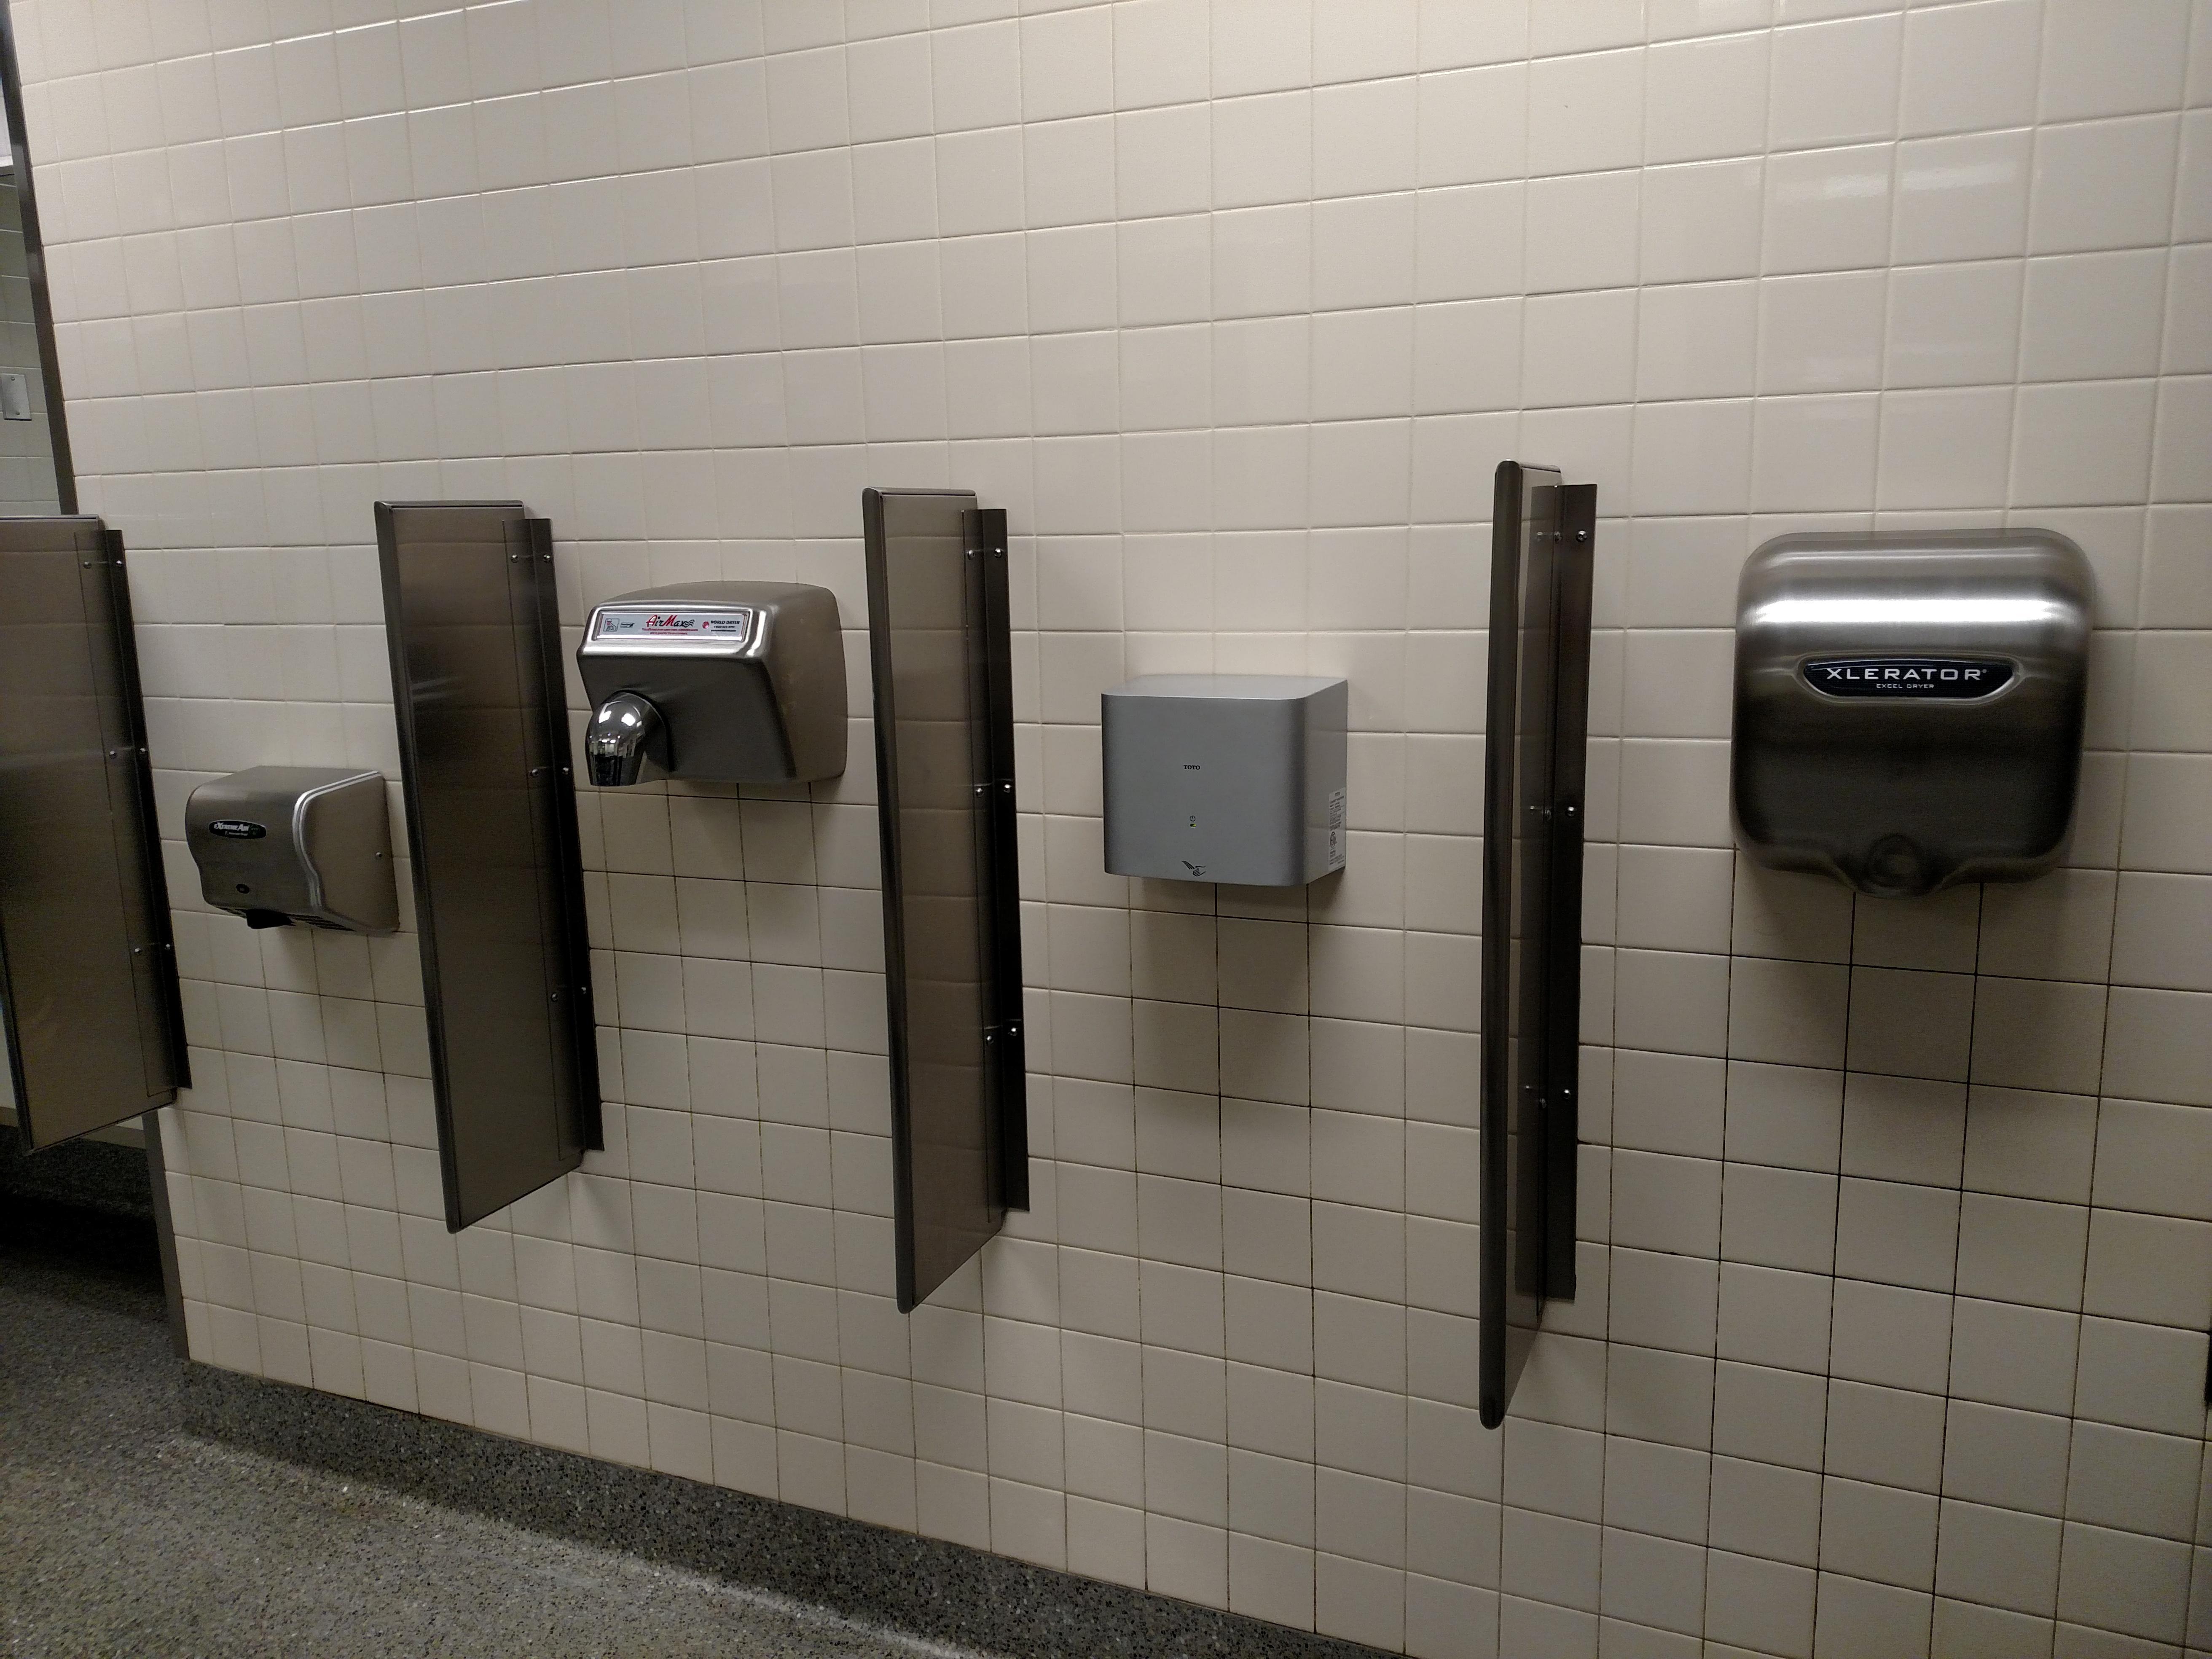 Bathroom has a choice of hand dryers  Rebrncom